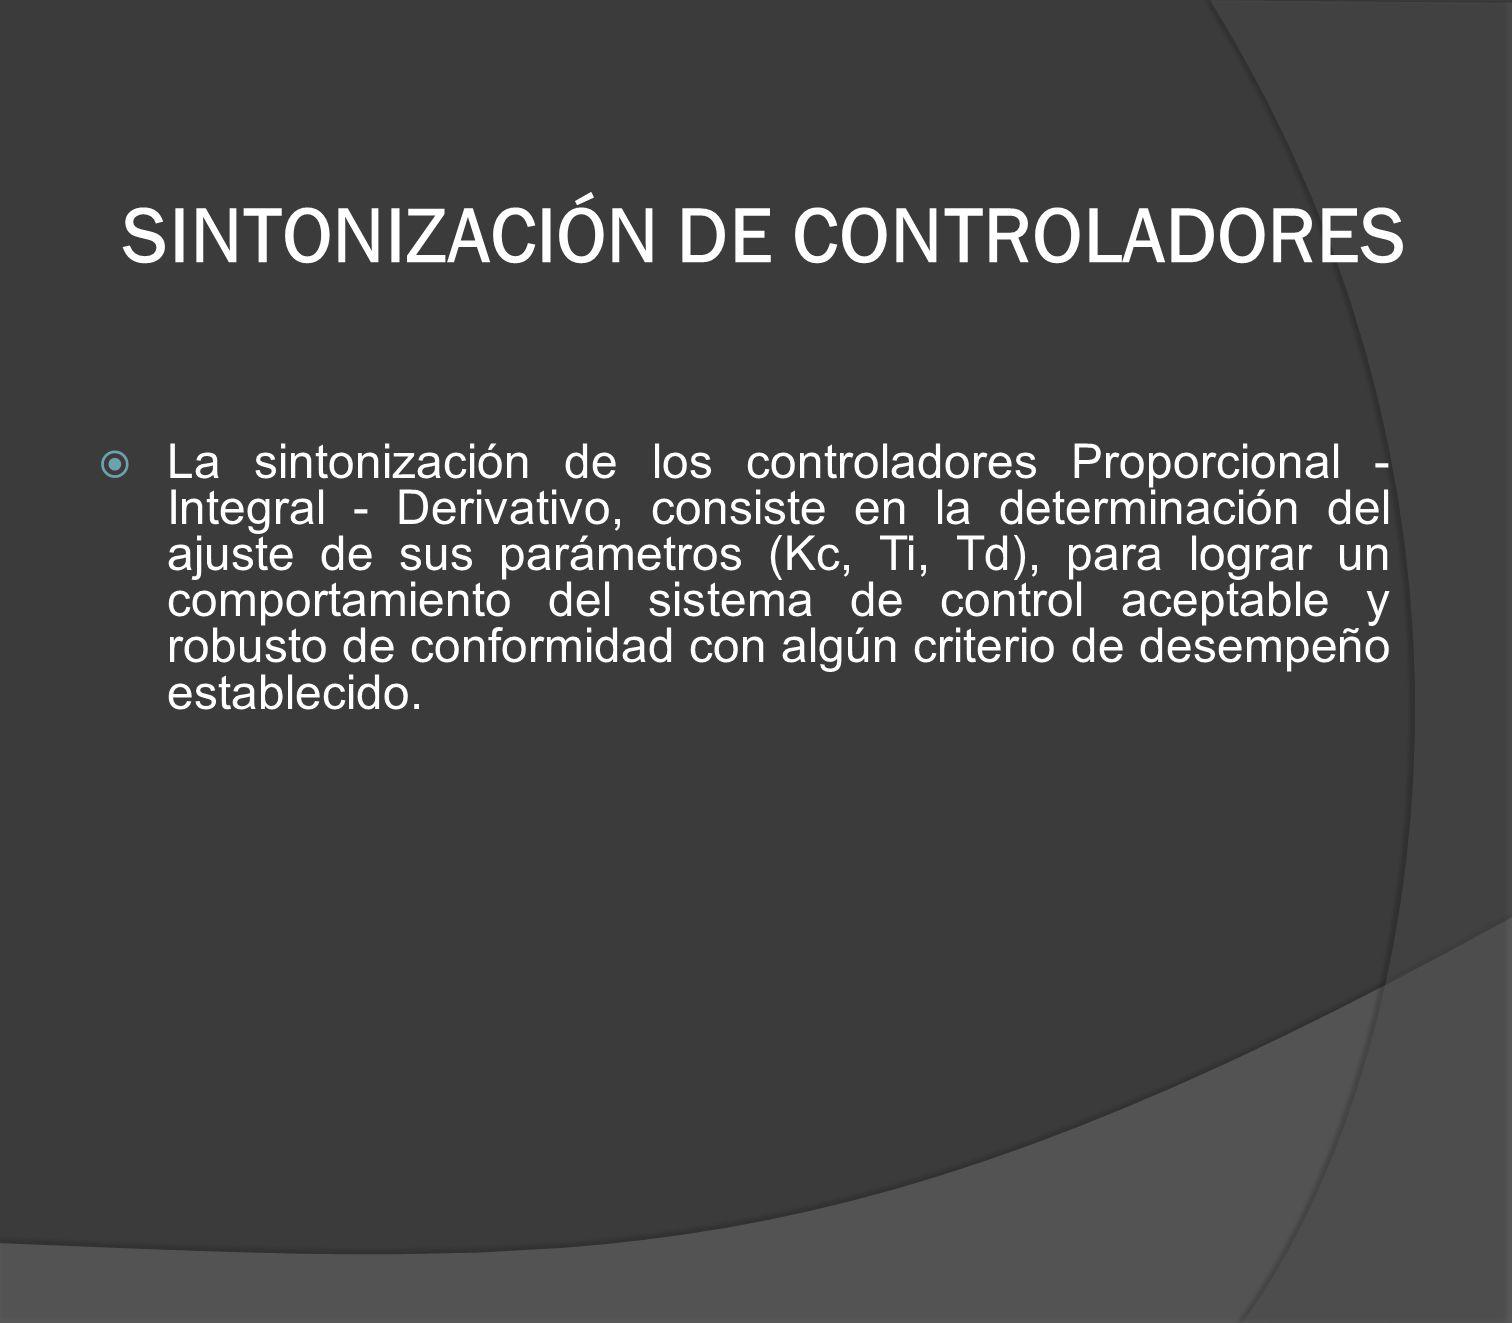 SINTONIZACIÓN DE CONTROLADORES